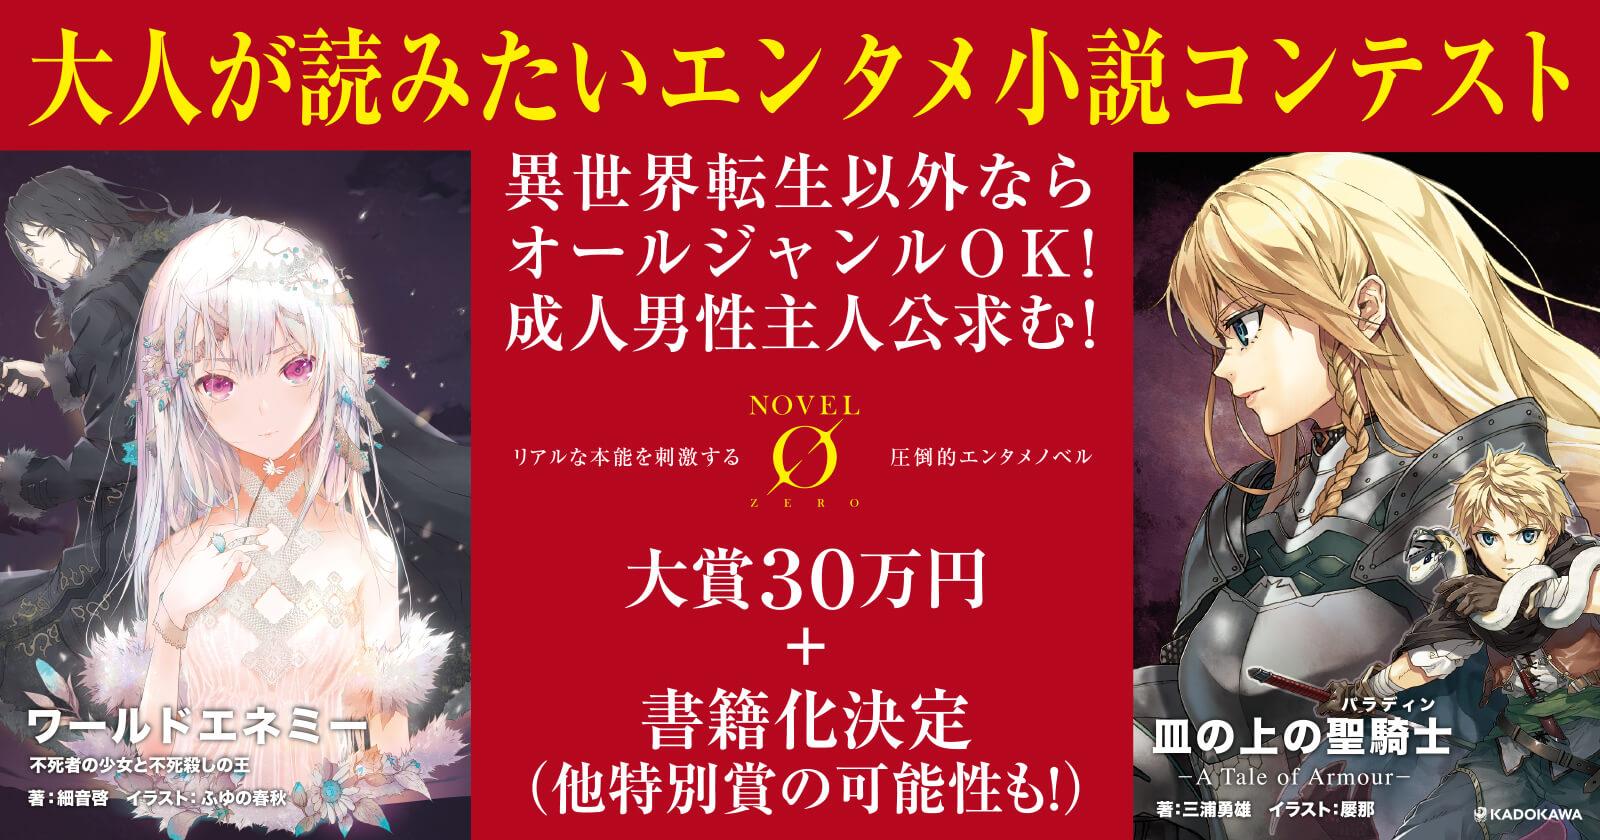 NOVEL 0「大人が読みたいエンタメ小説コンテスト」